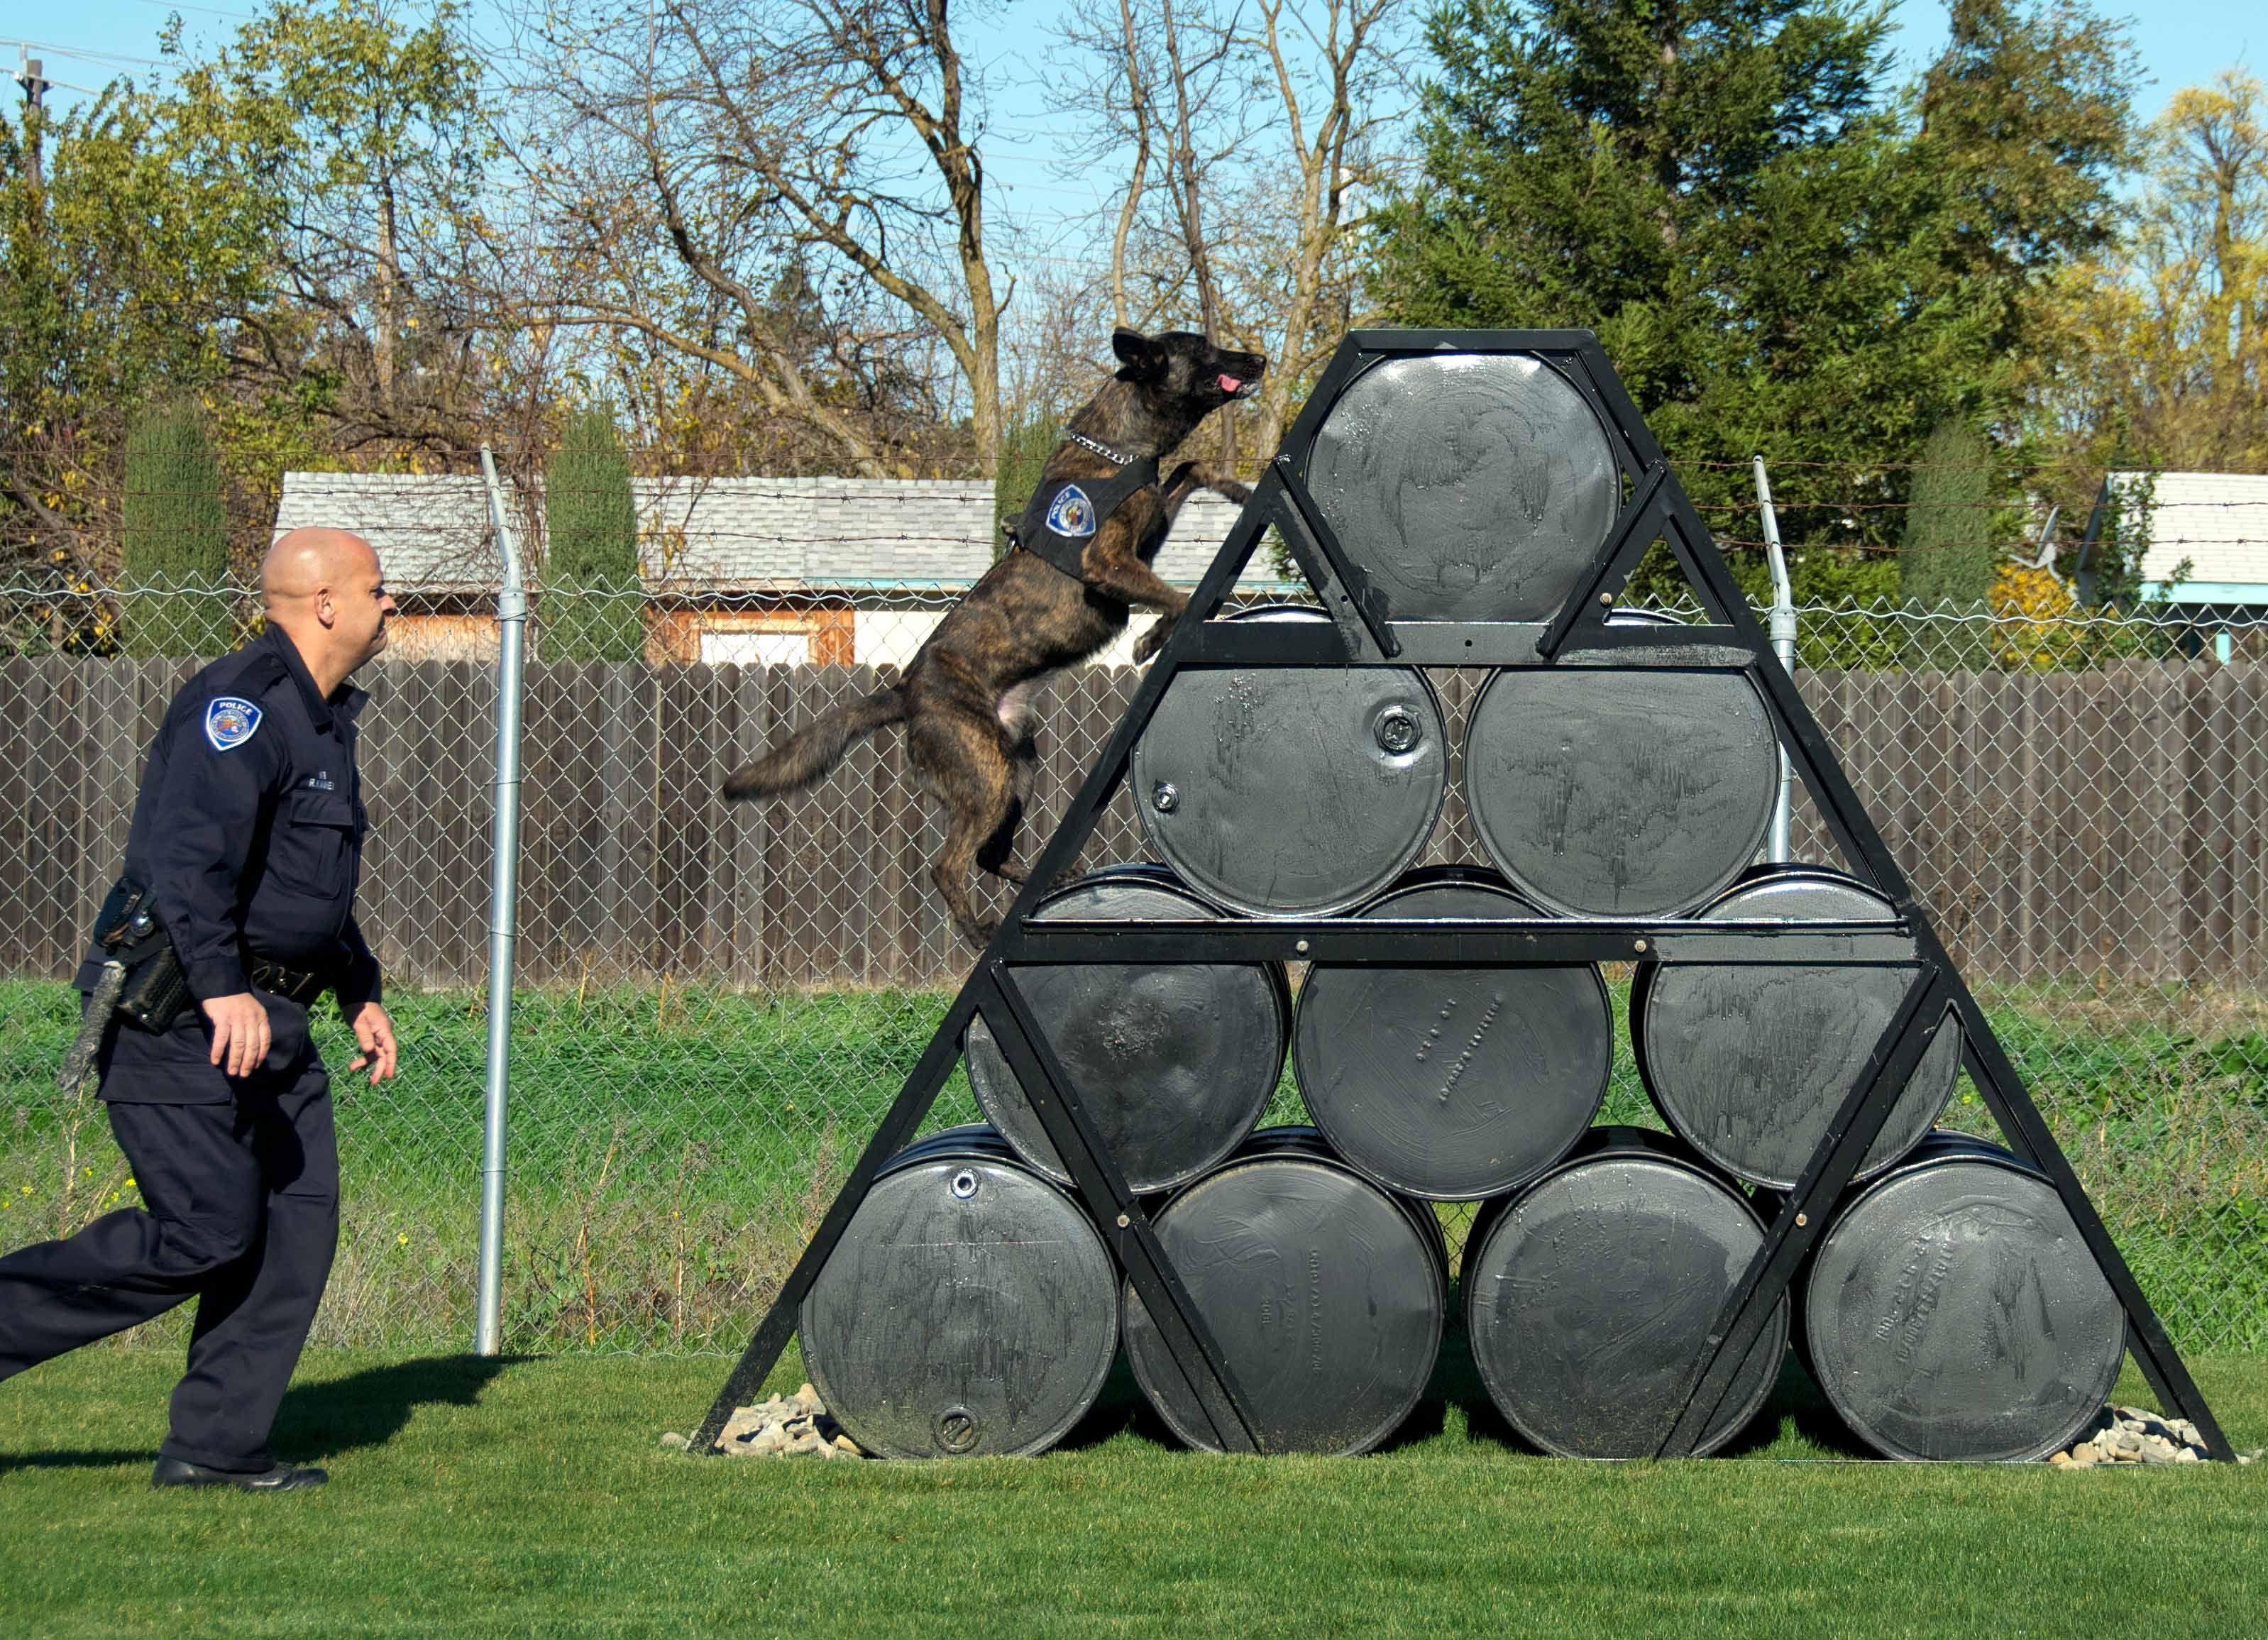 New K9 Training Facility Open Dog Training Equipment Agility